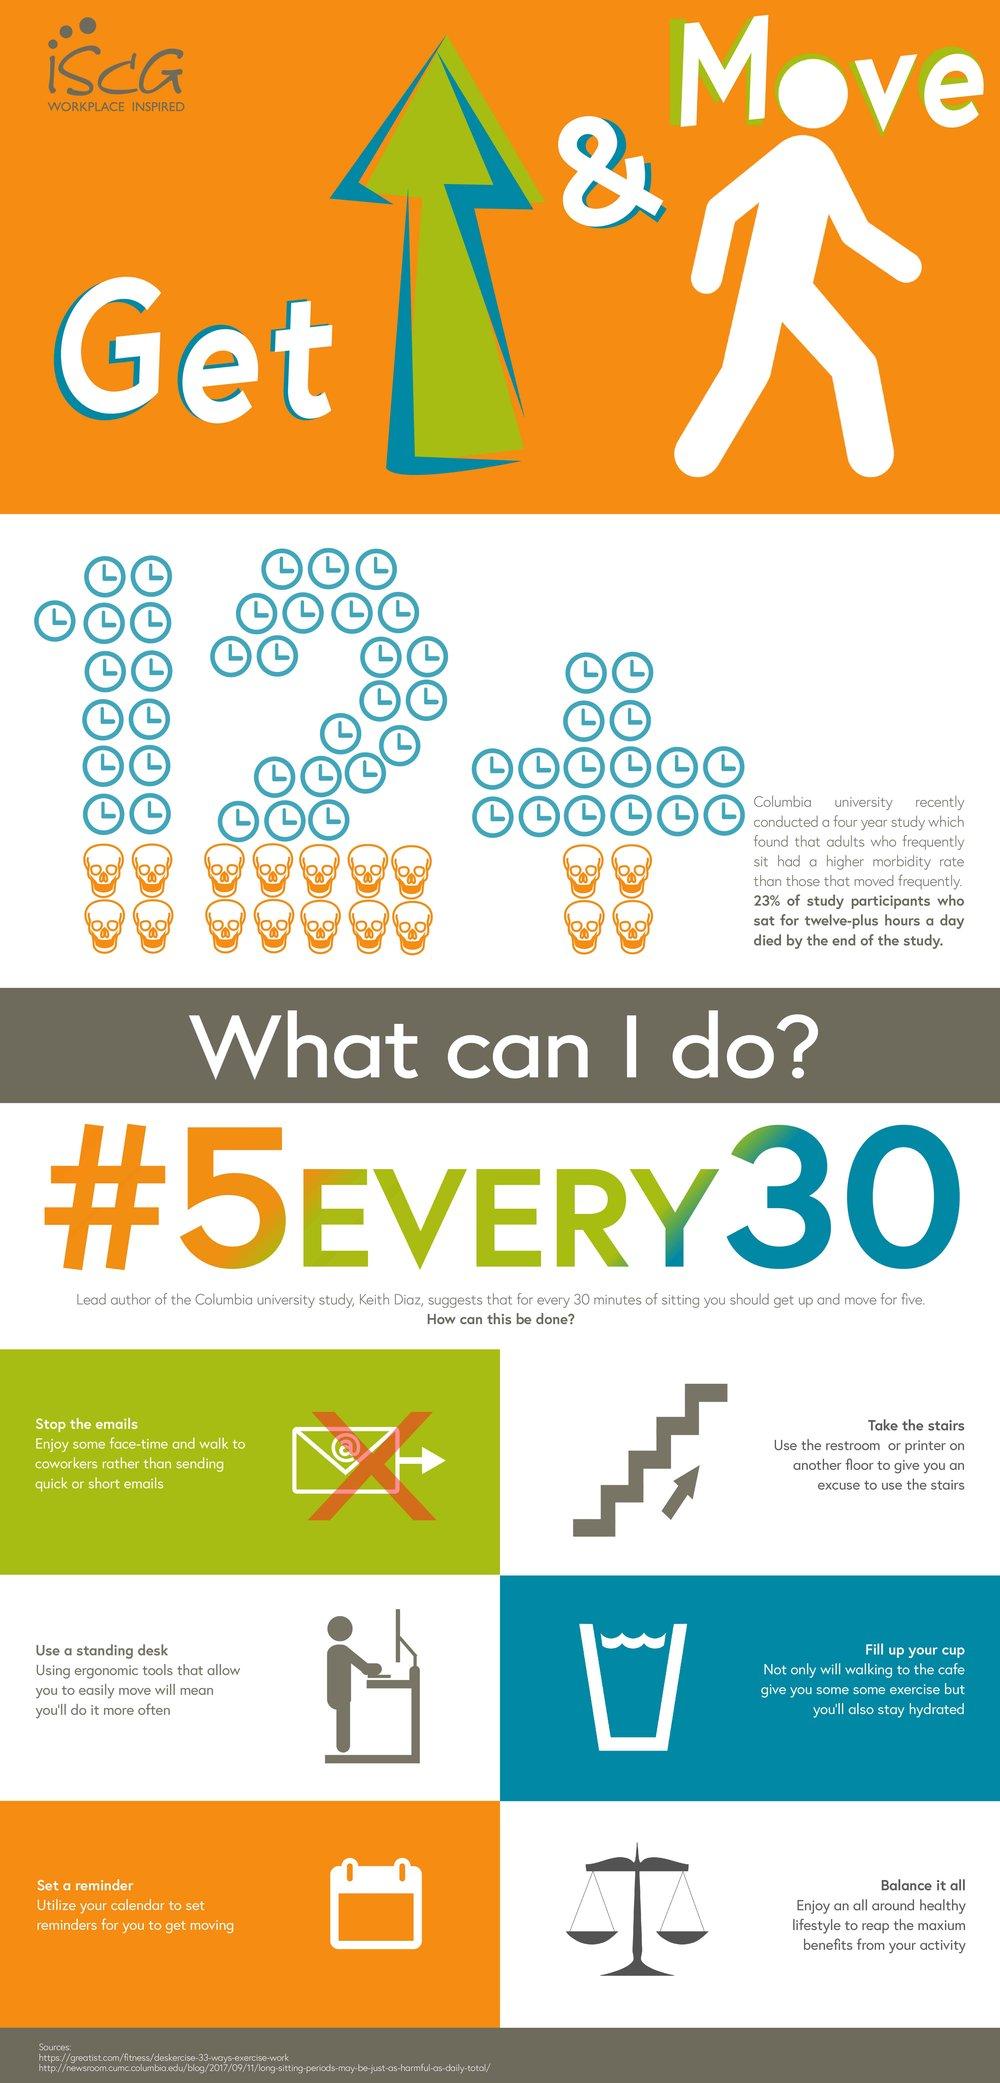 5 every 30 Infographic-01.jpg